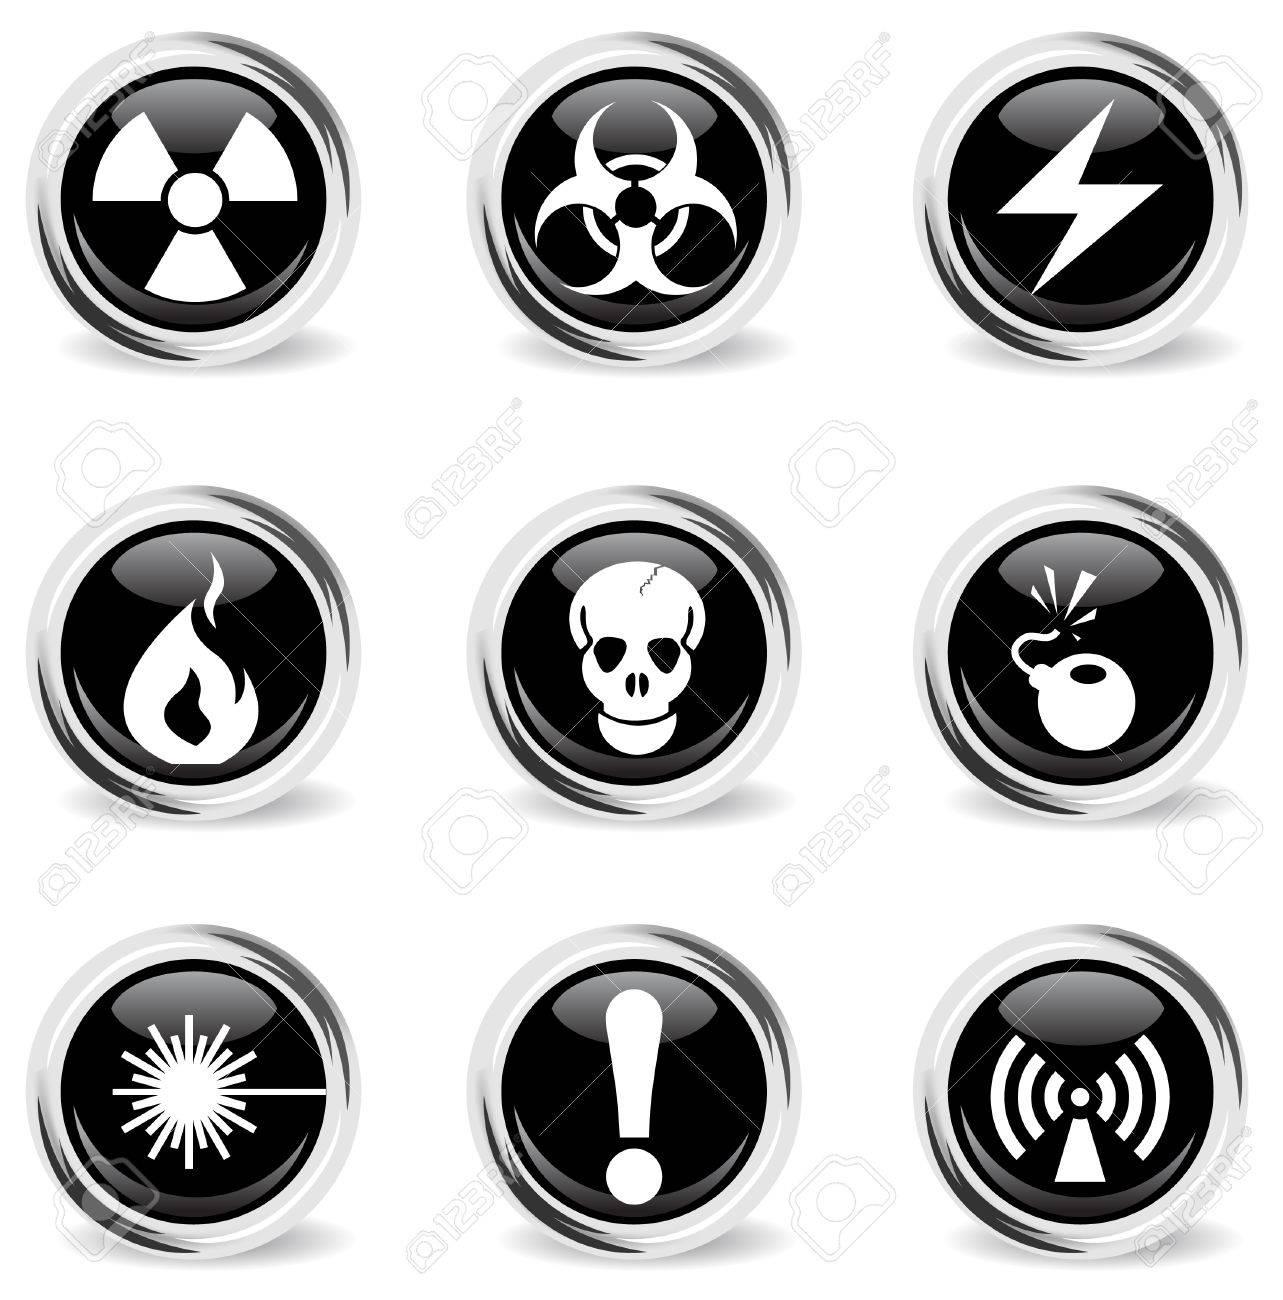 Hazard Sign Icons Stock Vector - 28962574